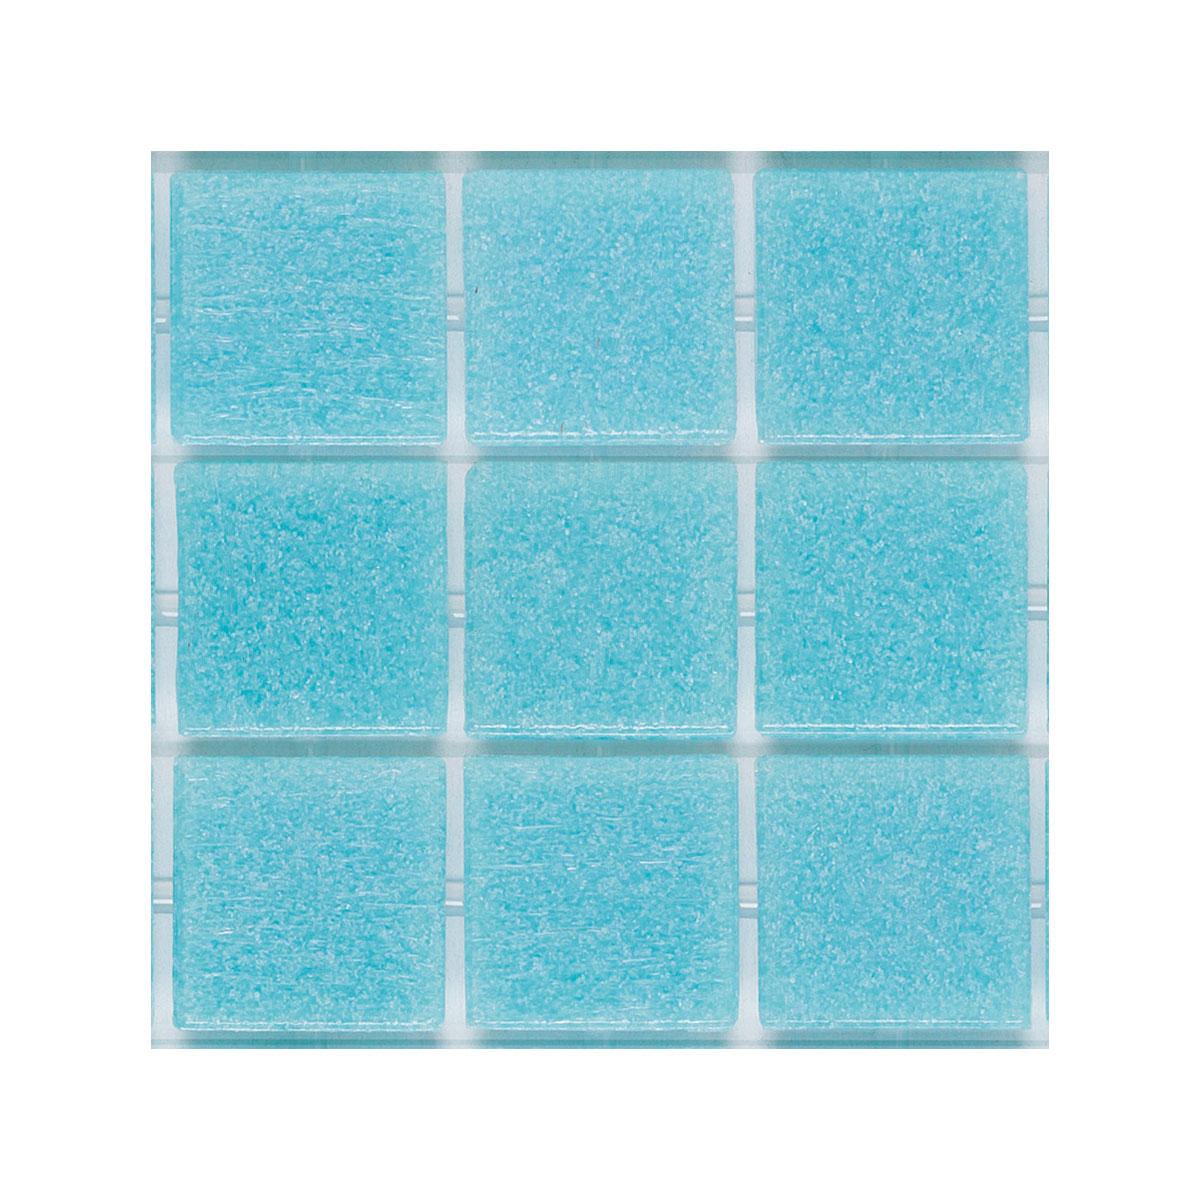 Vitreo - 122 blue - mosaic feature pool tiles - Stone3 Brisbane